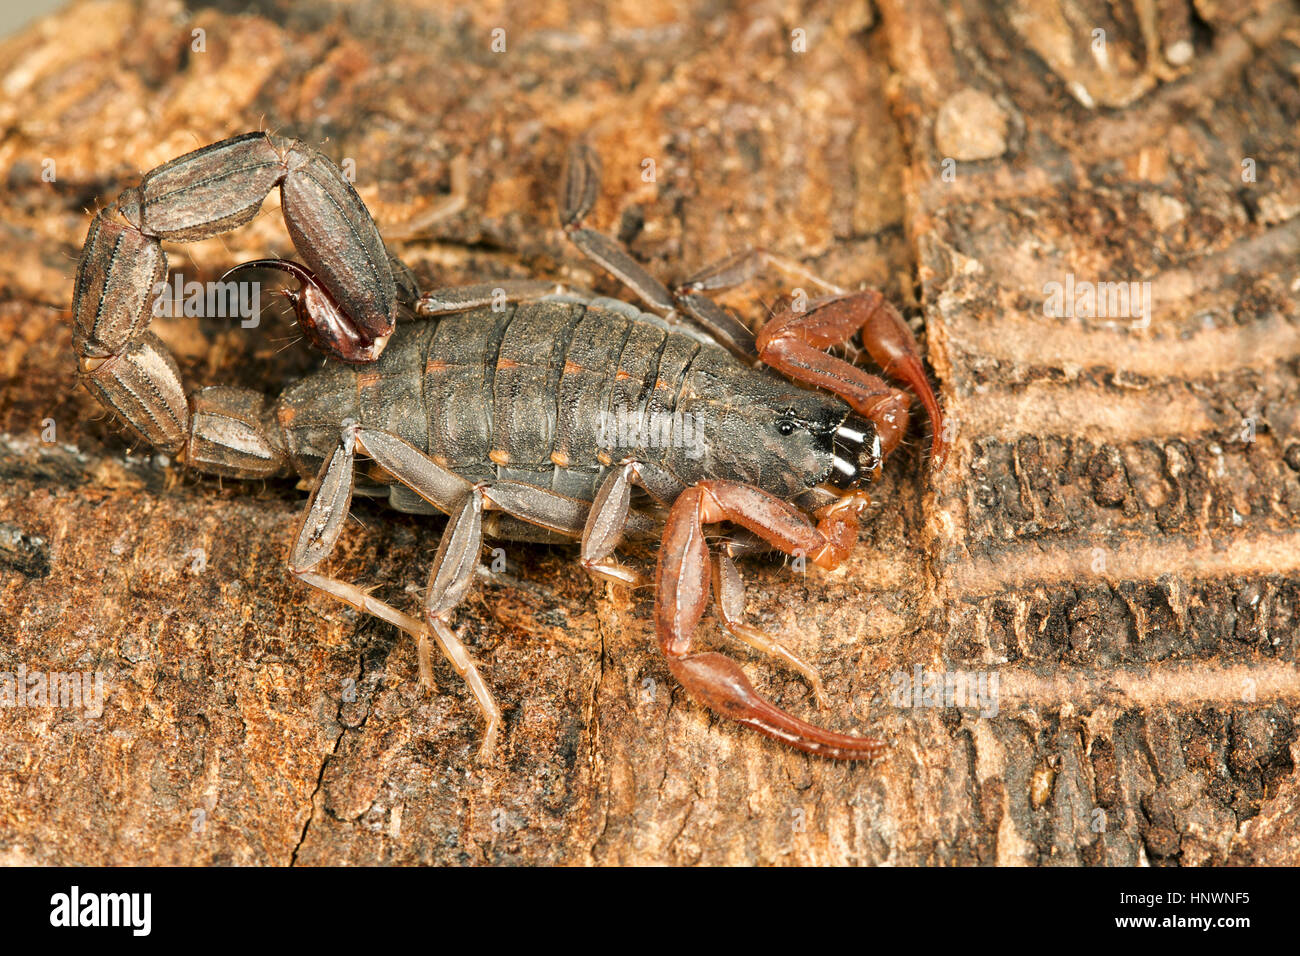 Three keeled bark scorpion, Lychas tricarinatus, Udanti